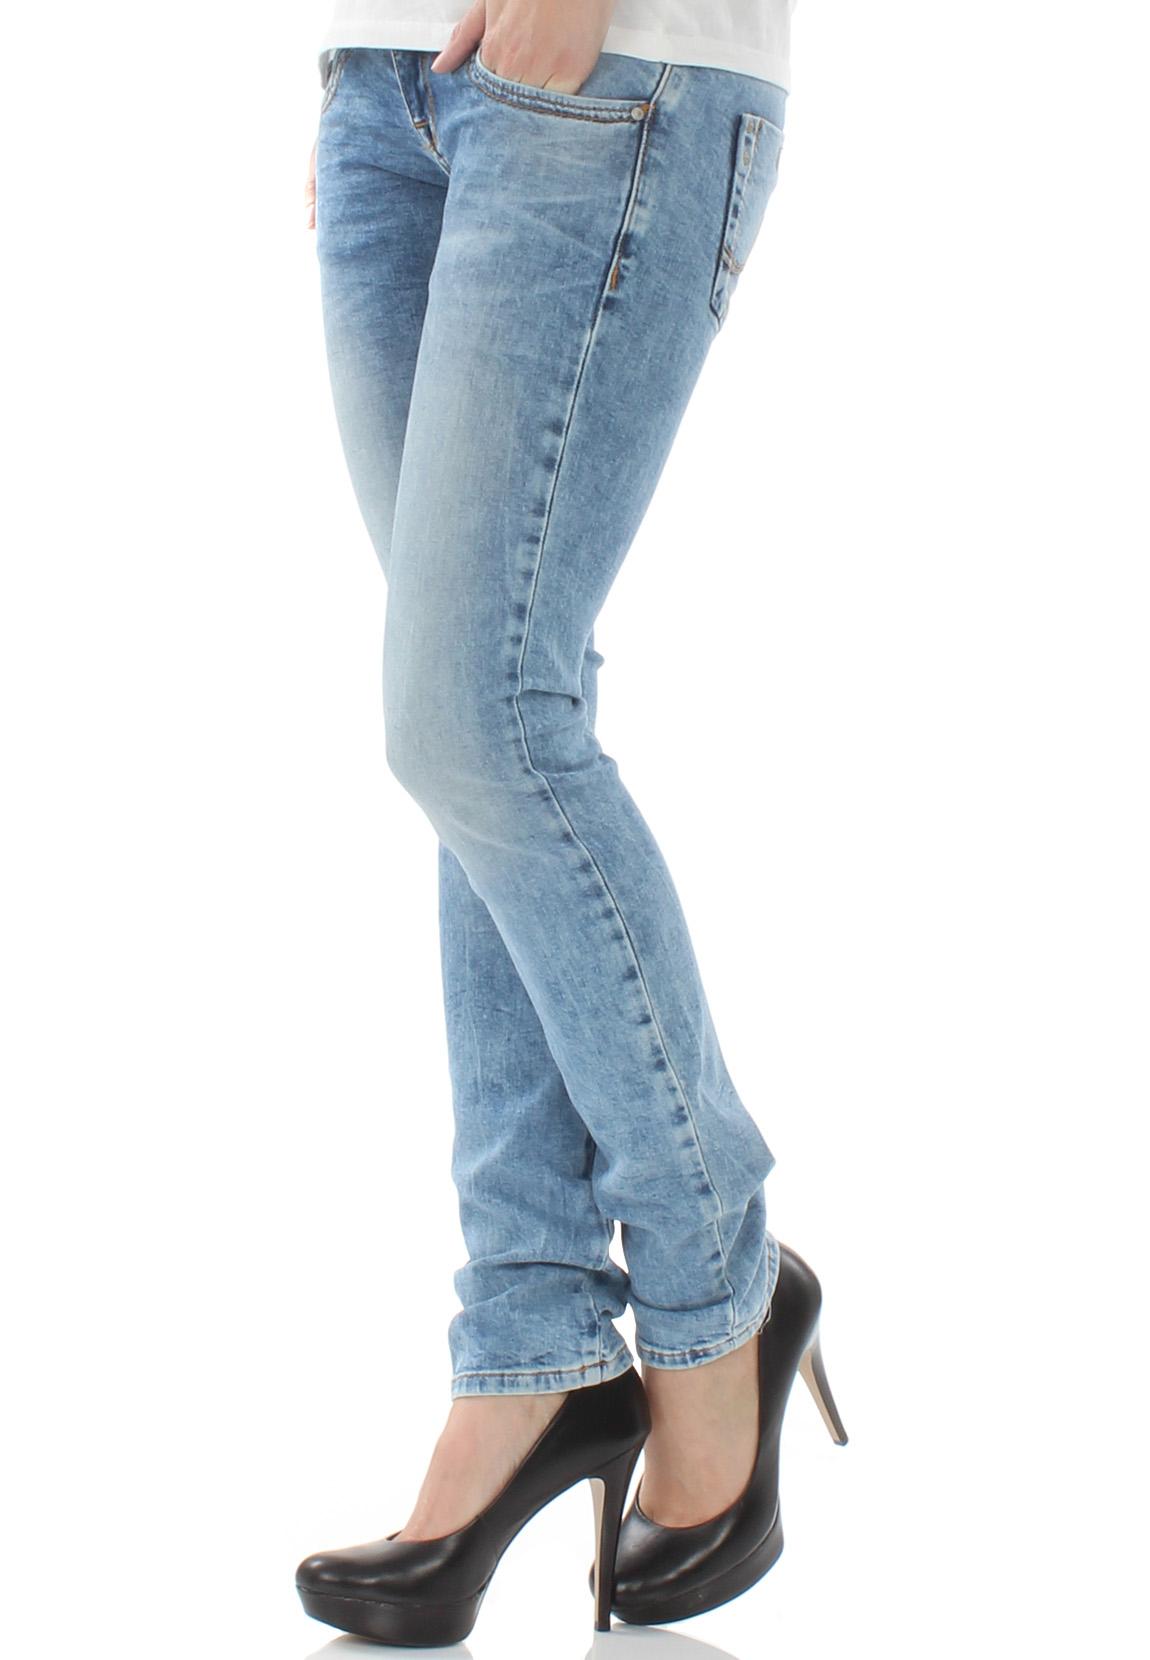 ltb jeans damen molly myra wash hellblau damen jeans hosen. Black Bedroom Furniture Sets. Home Design Ideas